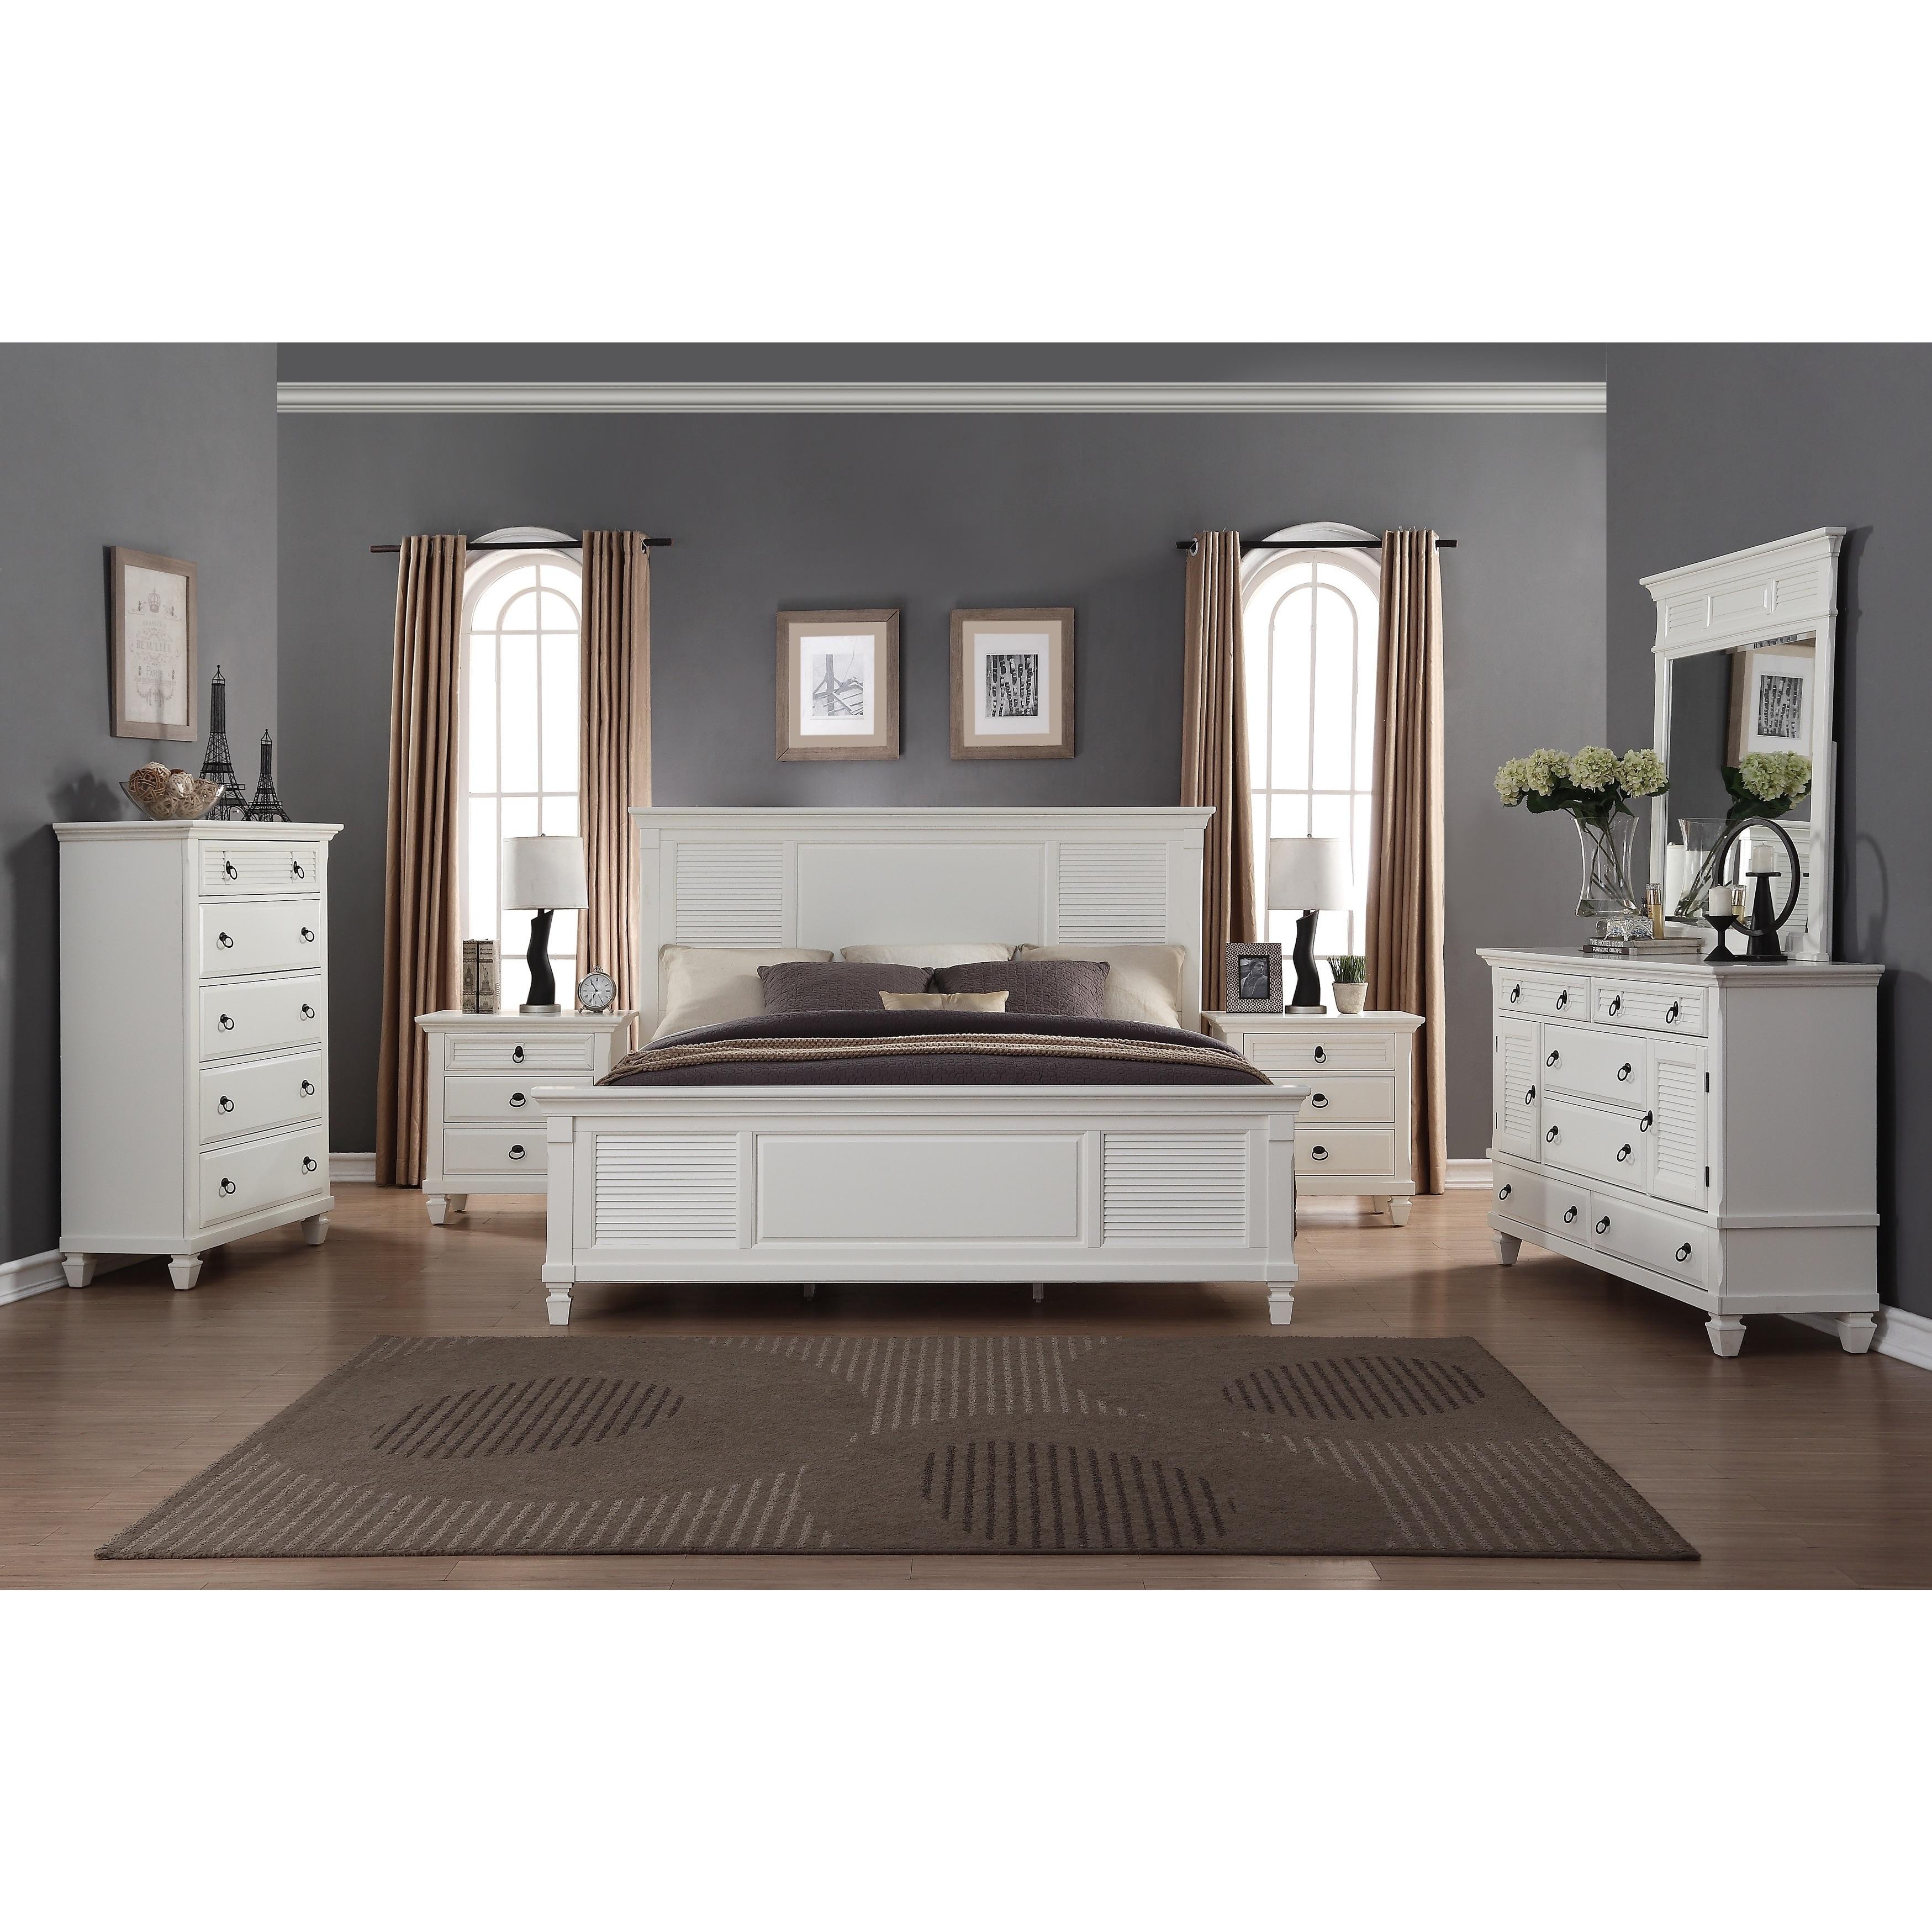 Shop Regitina White 6 Piece King Size Bedroom Furniture Set On